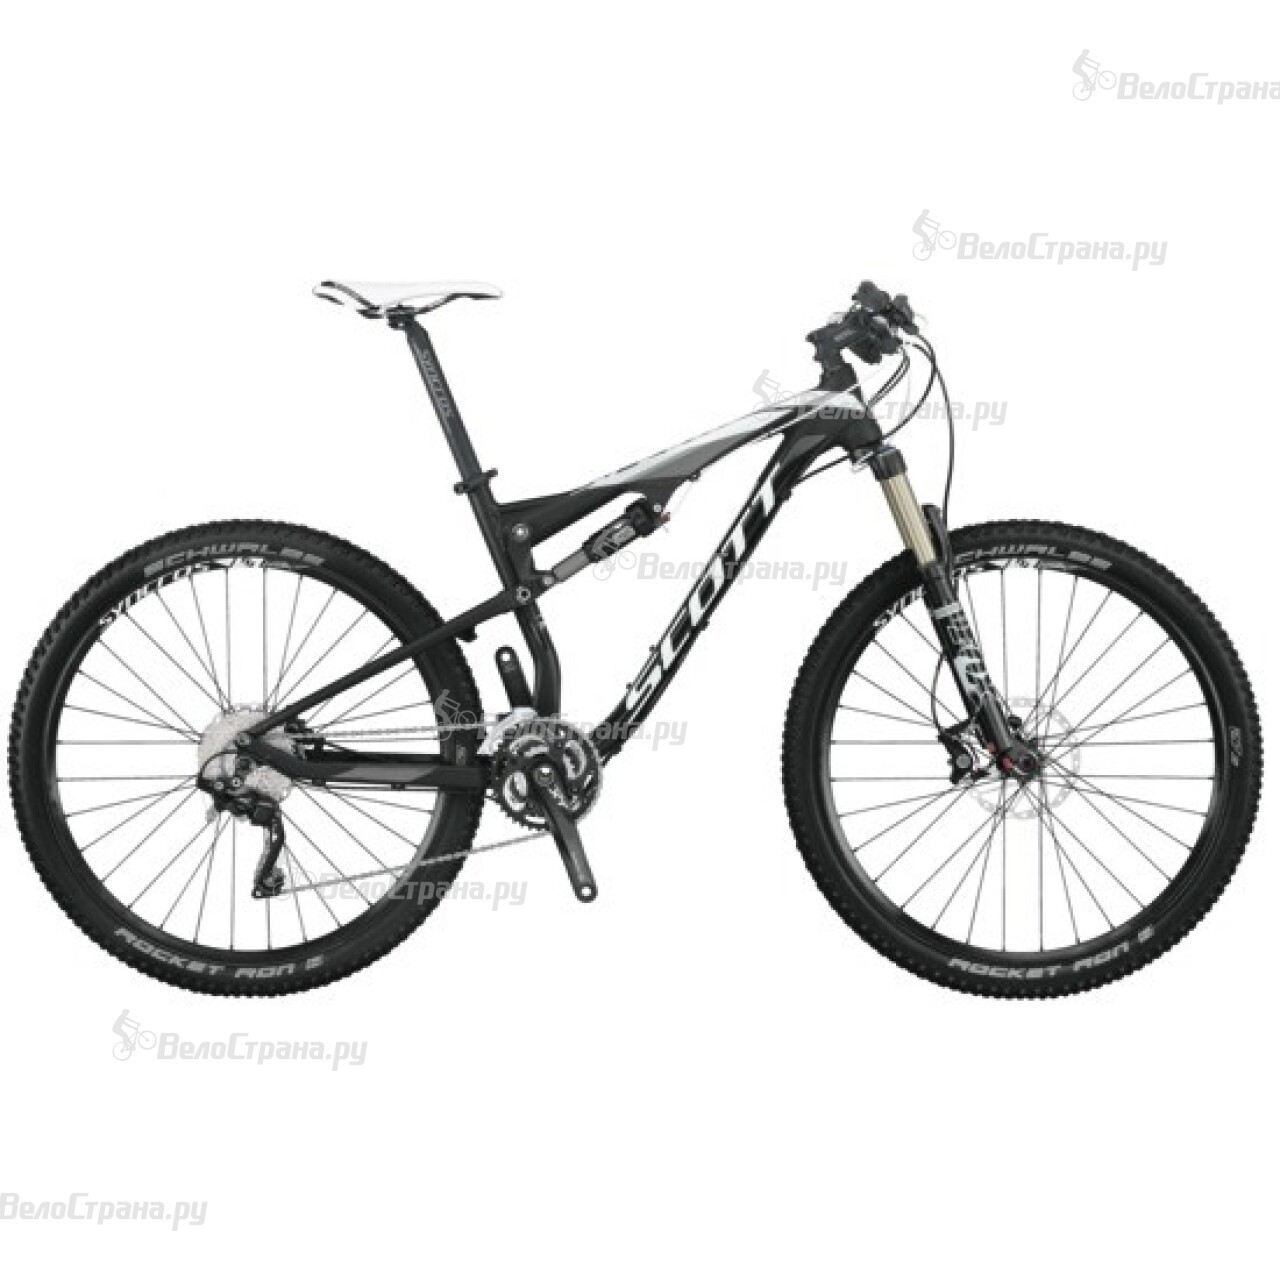 Велосипед Scott Spark 740 (2014)